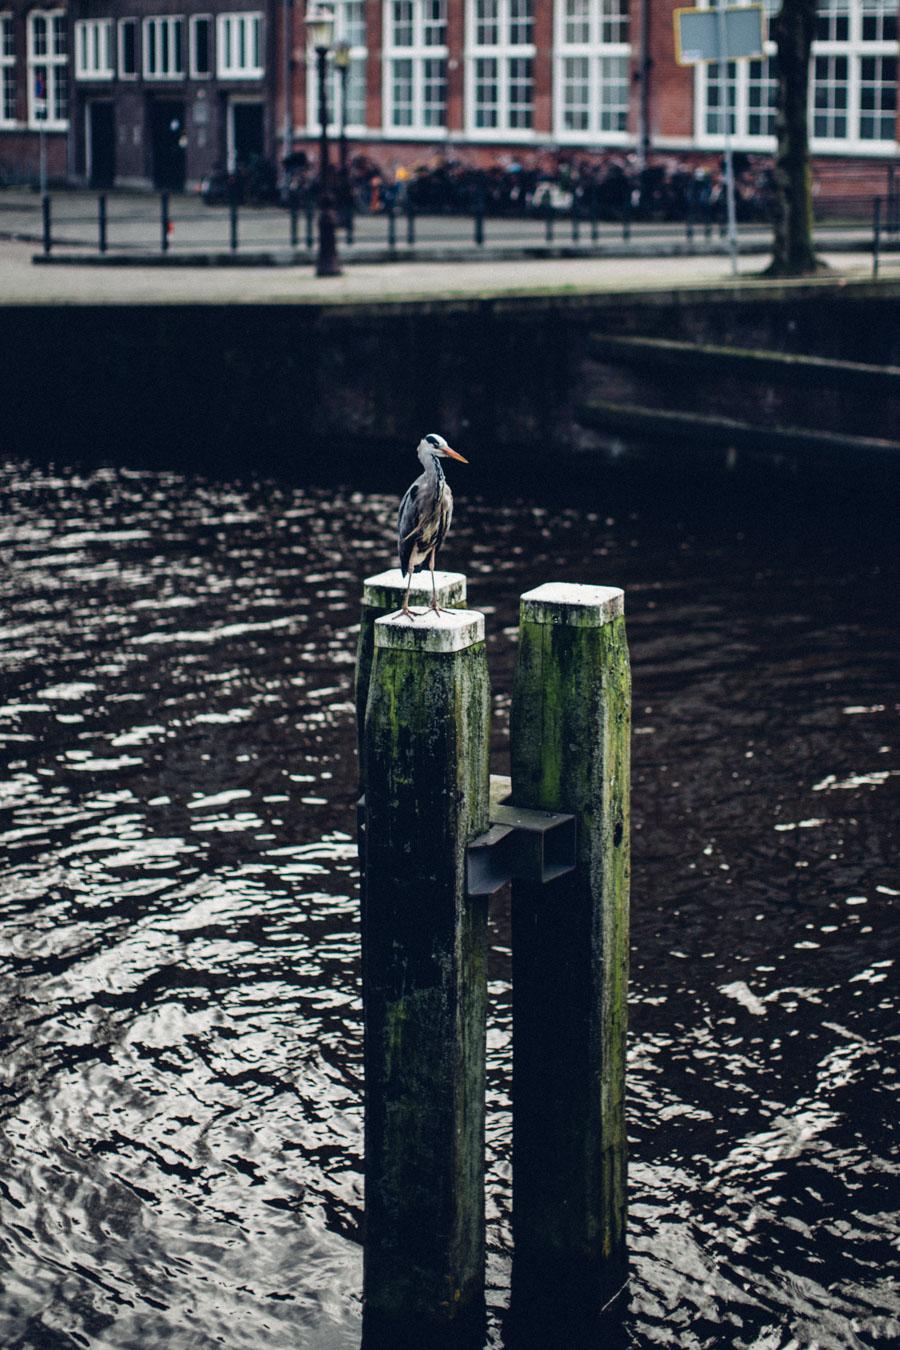 Amsterdam canal wildlife